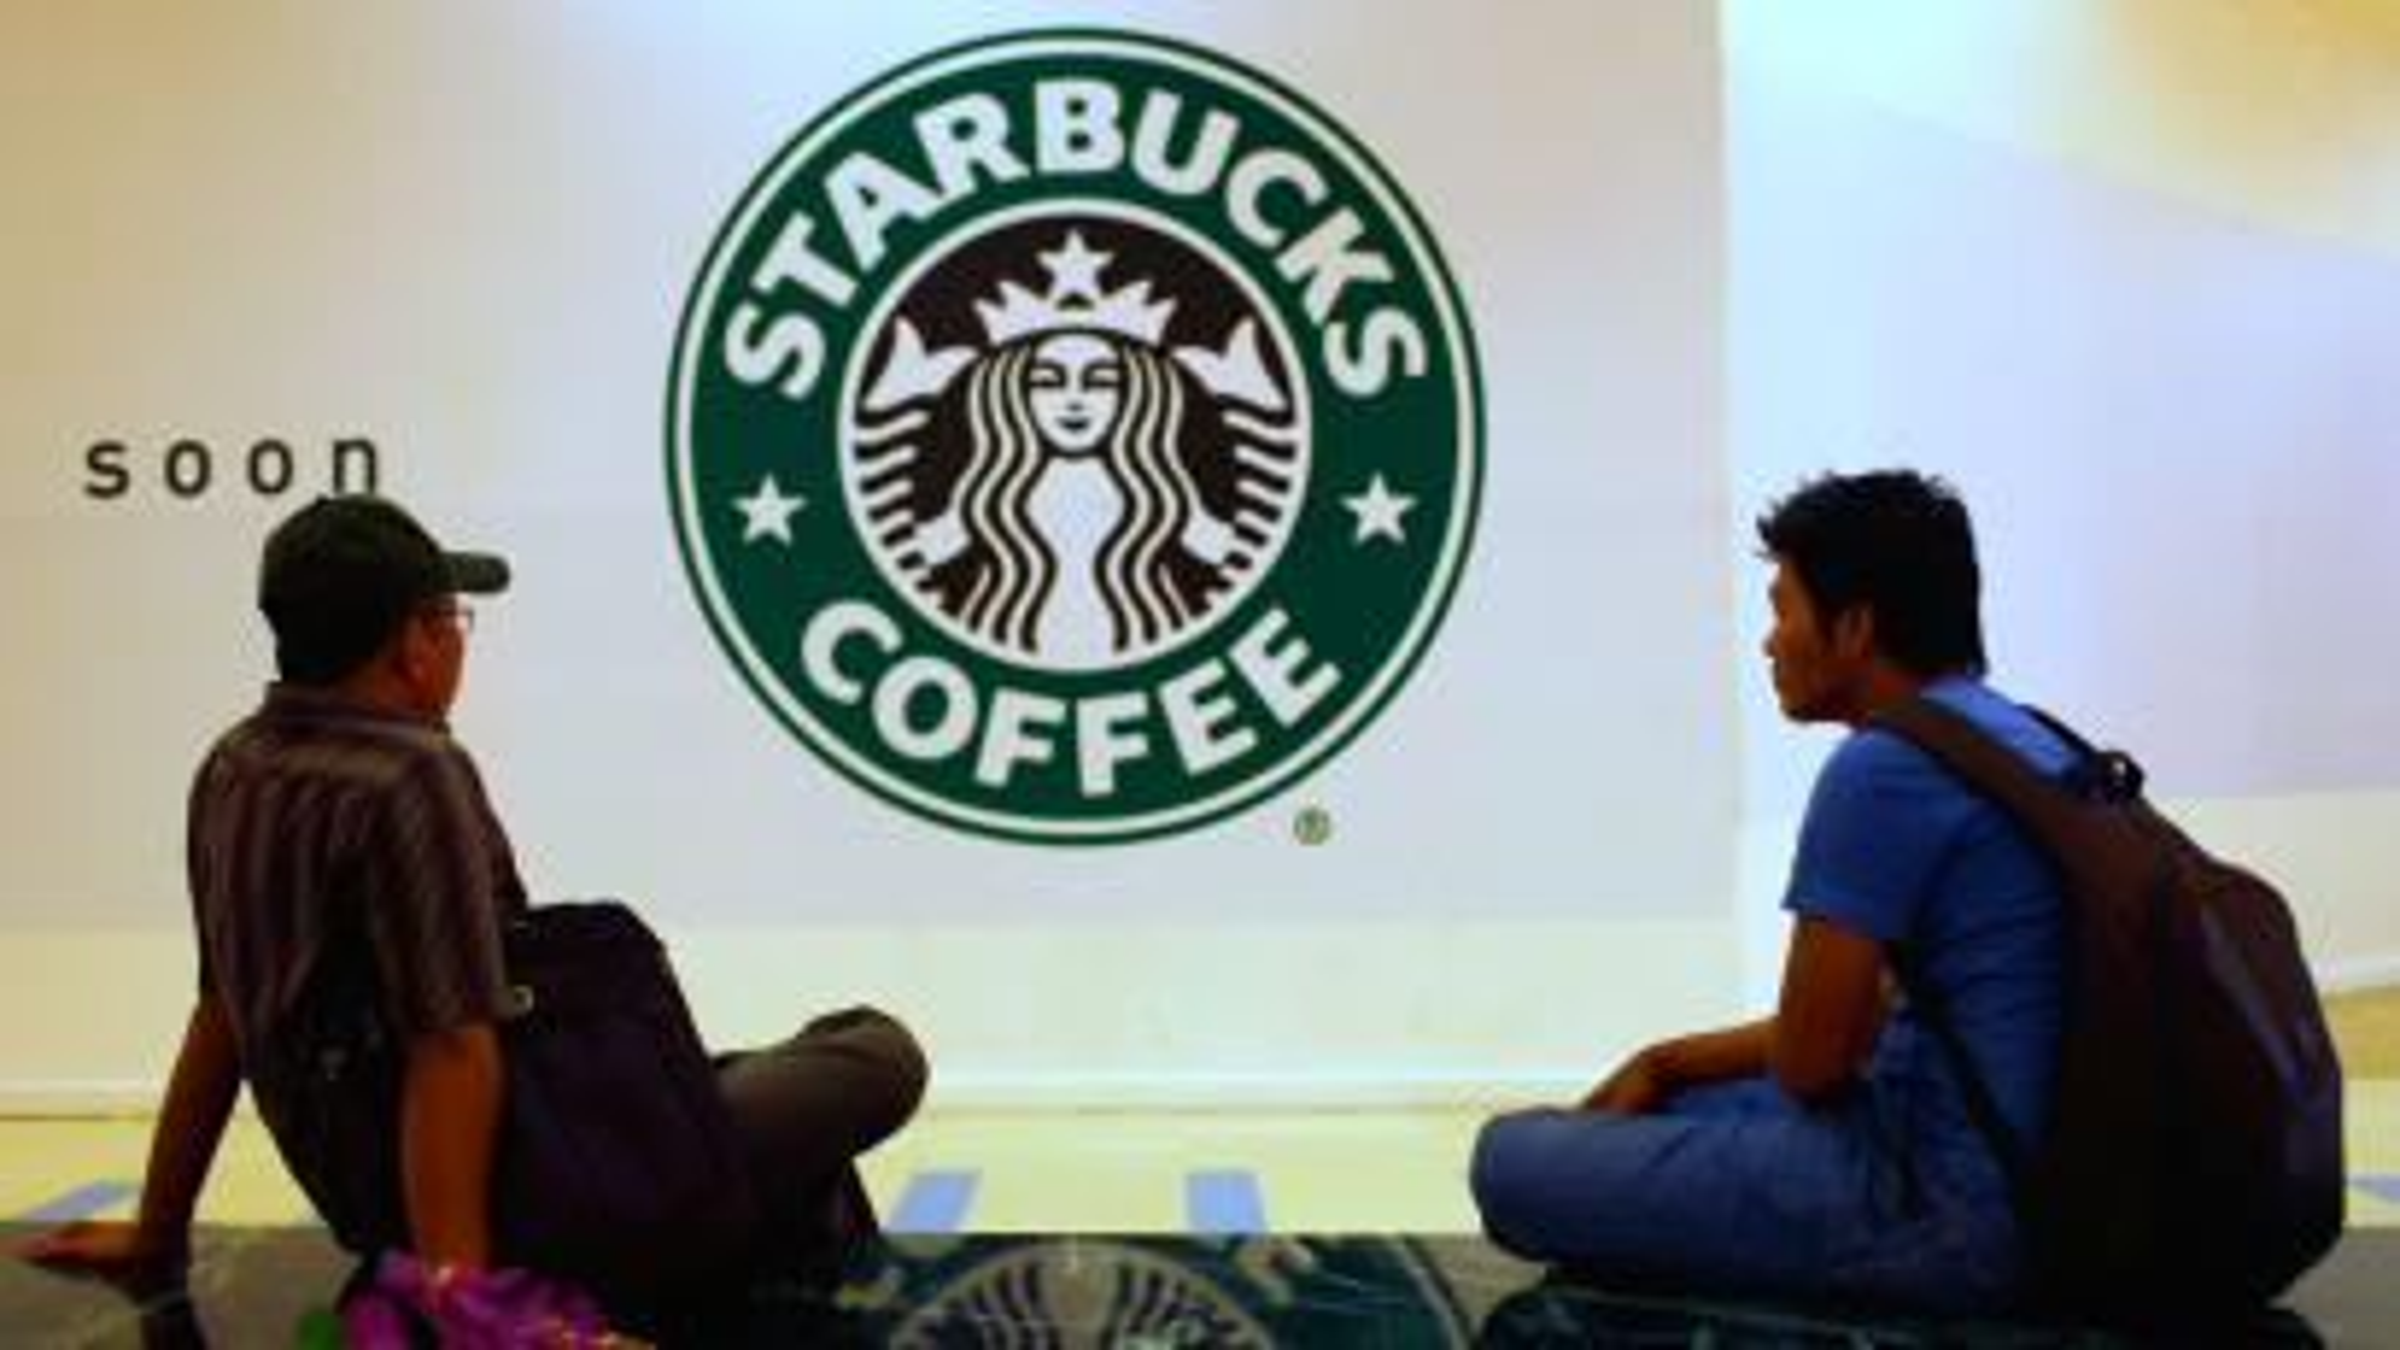 Starbucks coffee shop opening